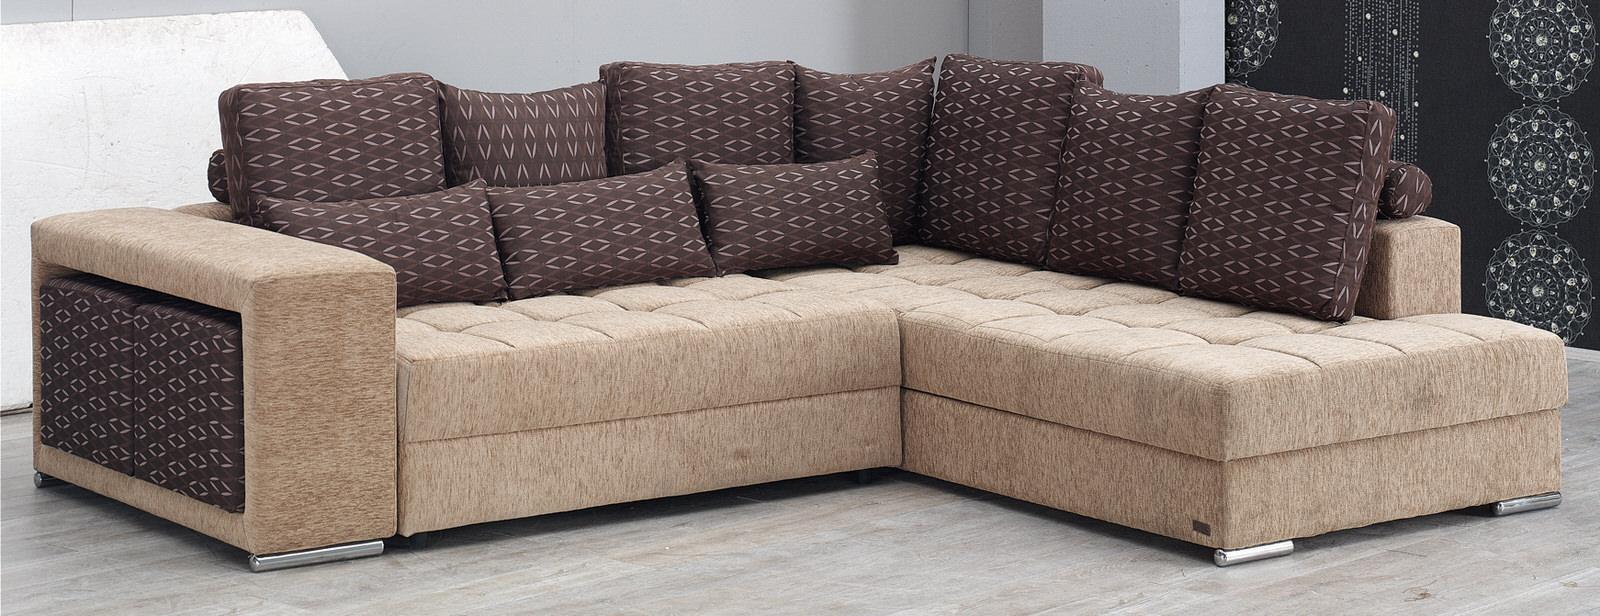 Los Angeles Sectional Sofa Setempire Furniture Usa For Sectional Sofas Los Angeles (Image 13 of 20)